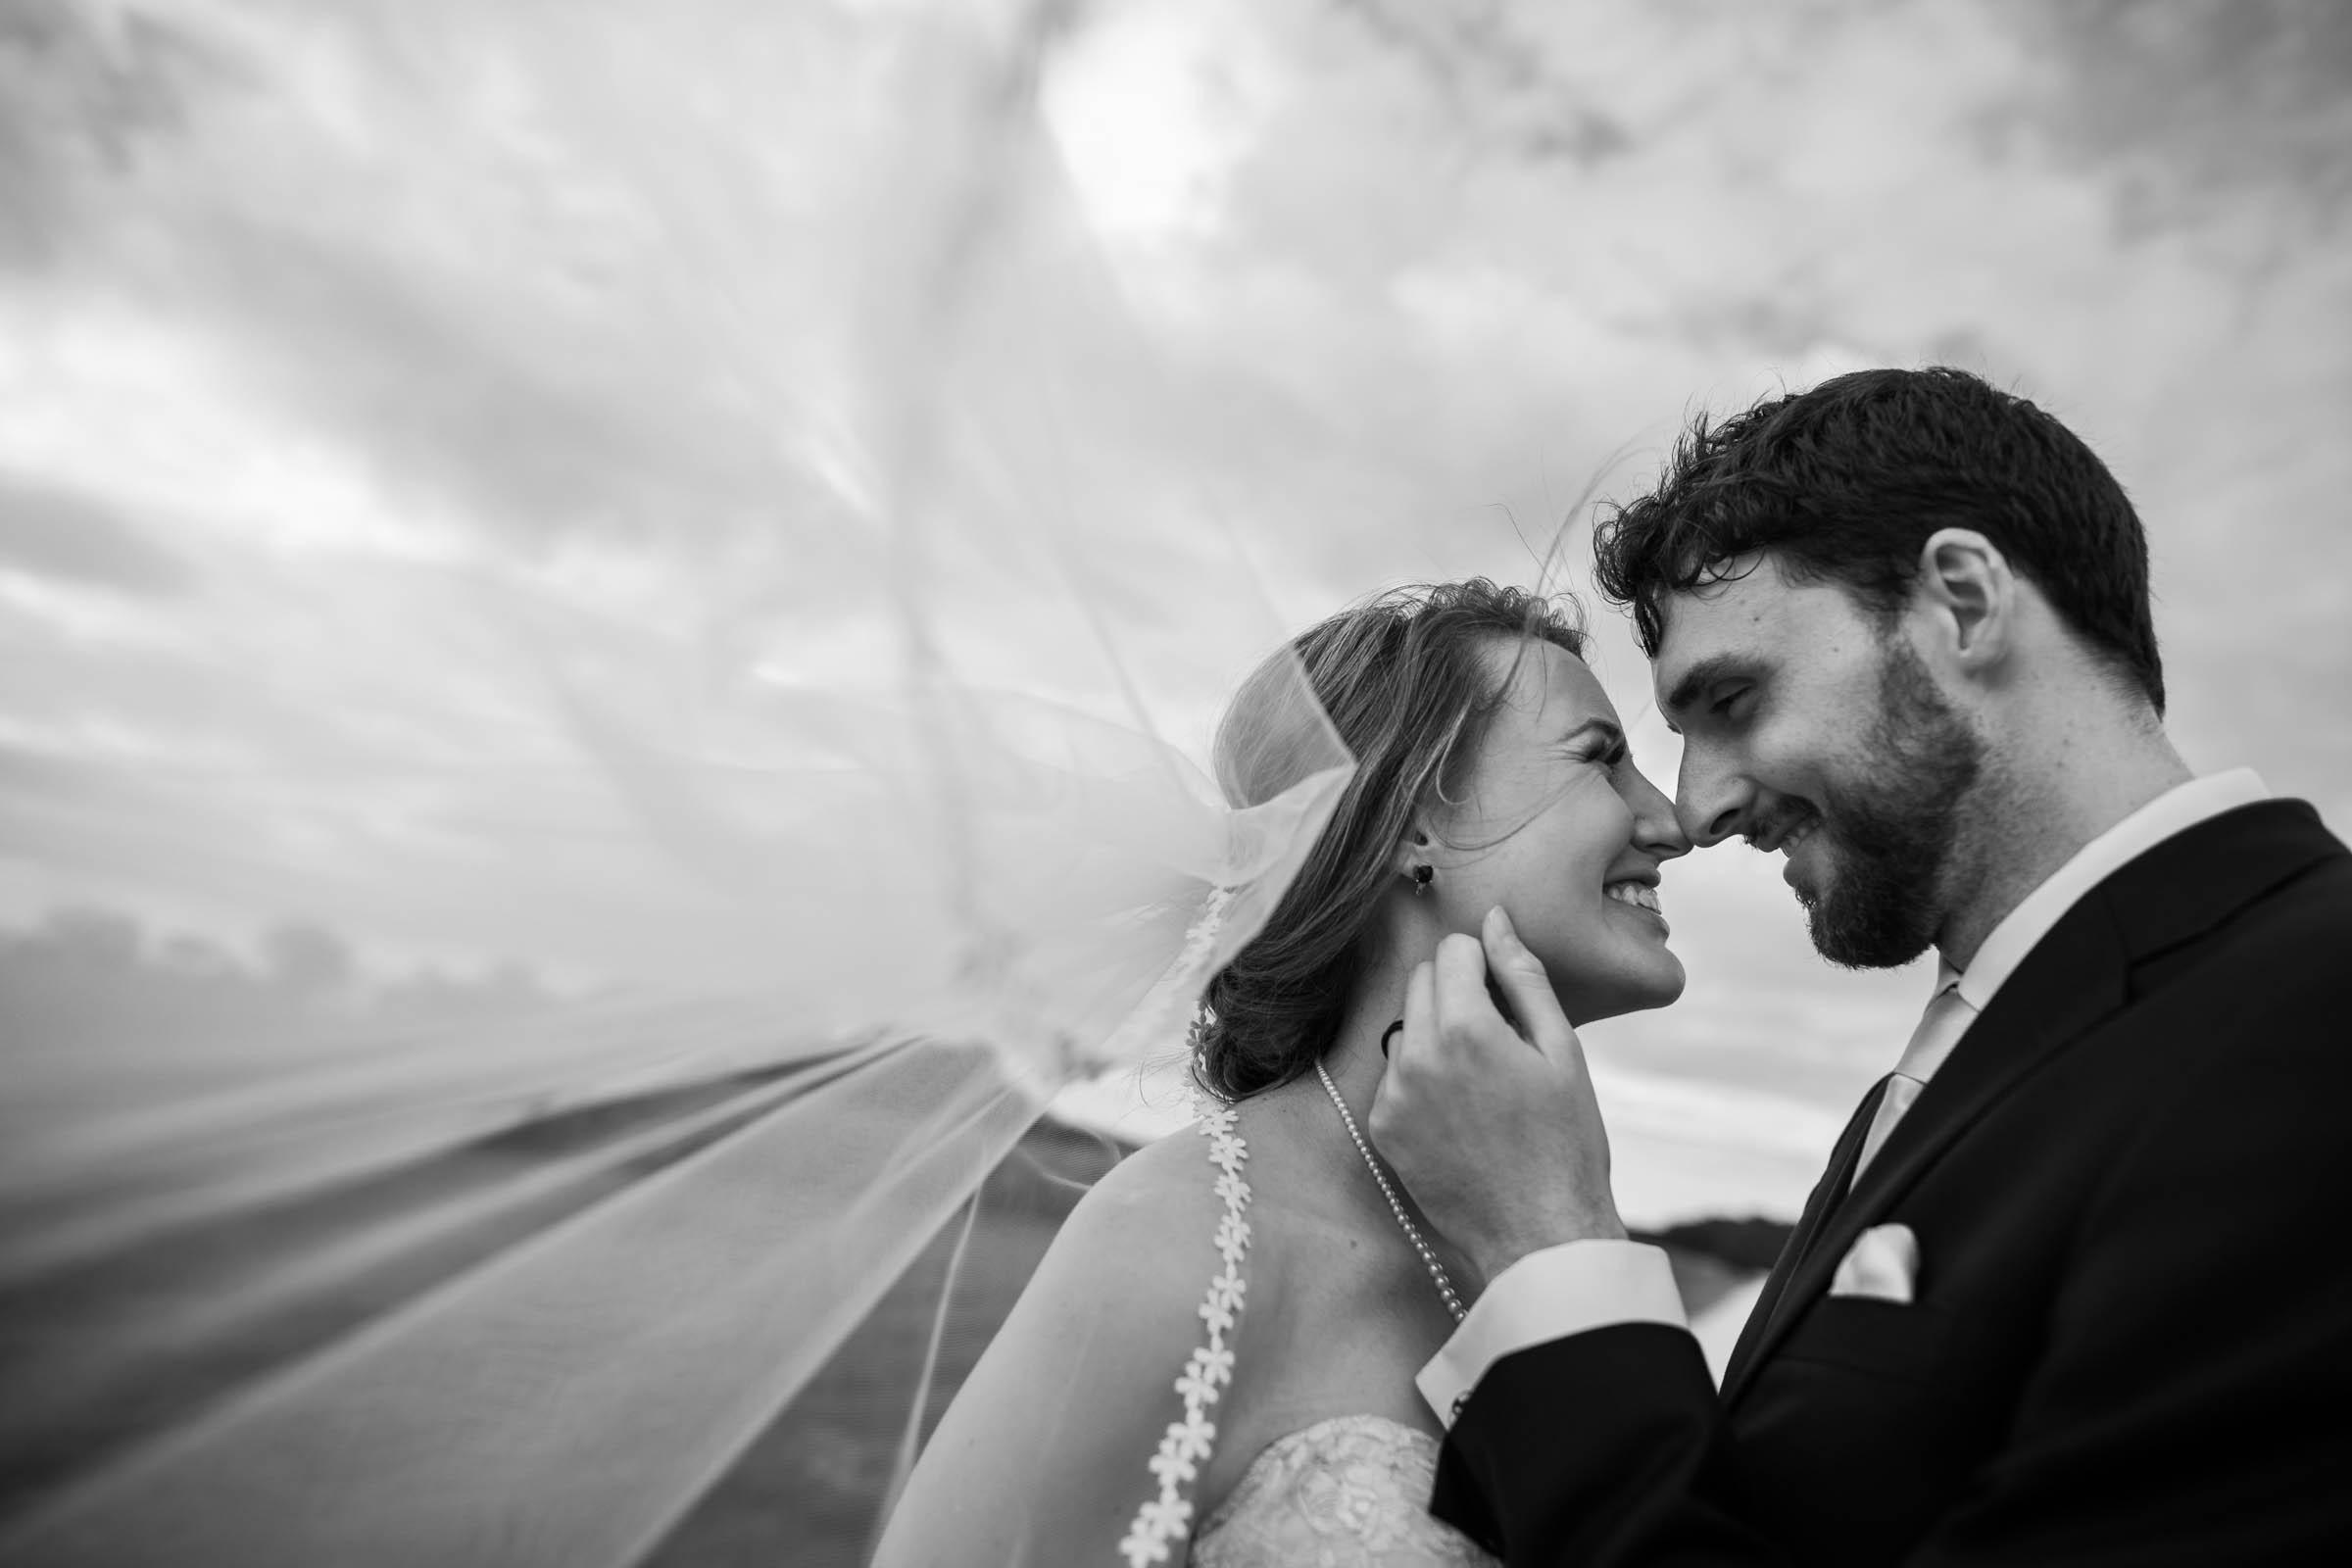 Best Wedding Photographers in Baltimore Maryland Megapixels Media PHOTOGRAPHY (23 of 25).jpg